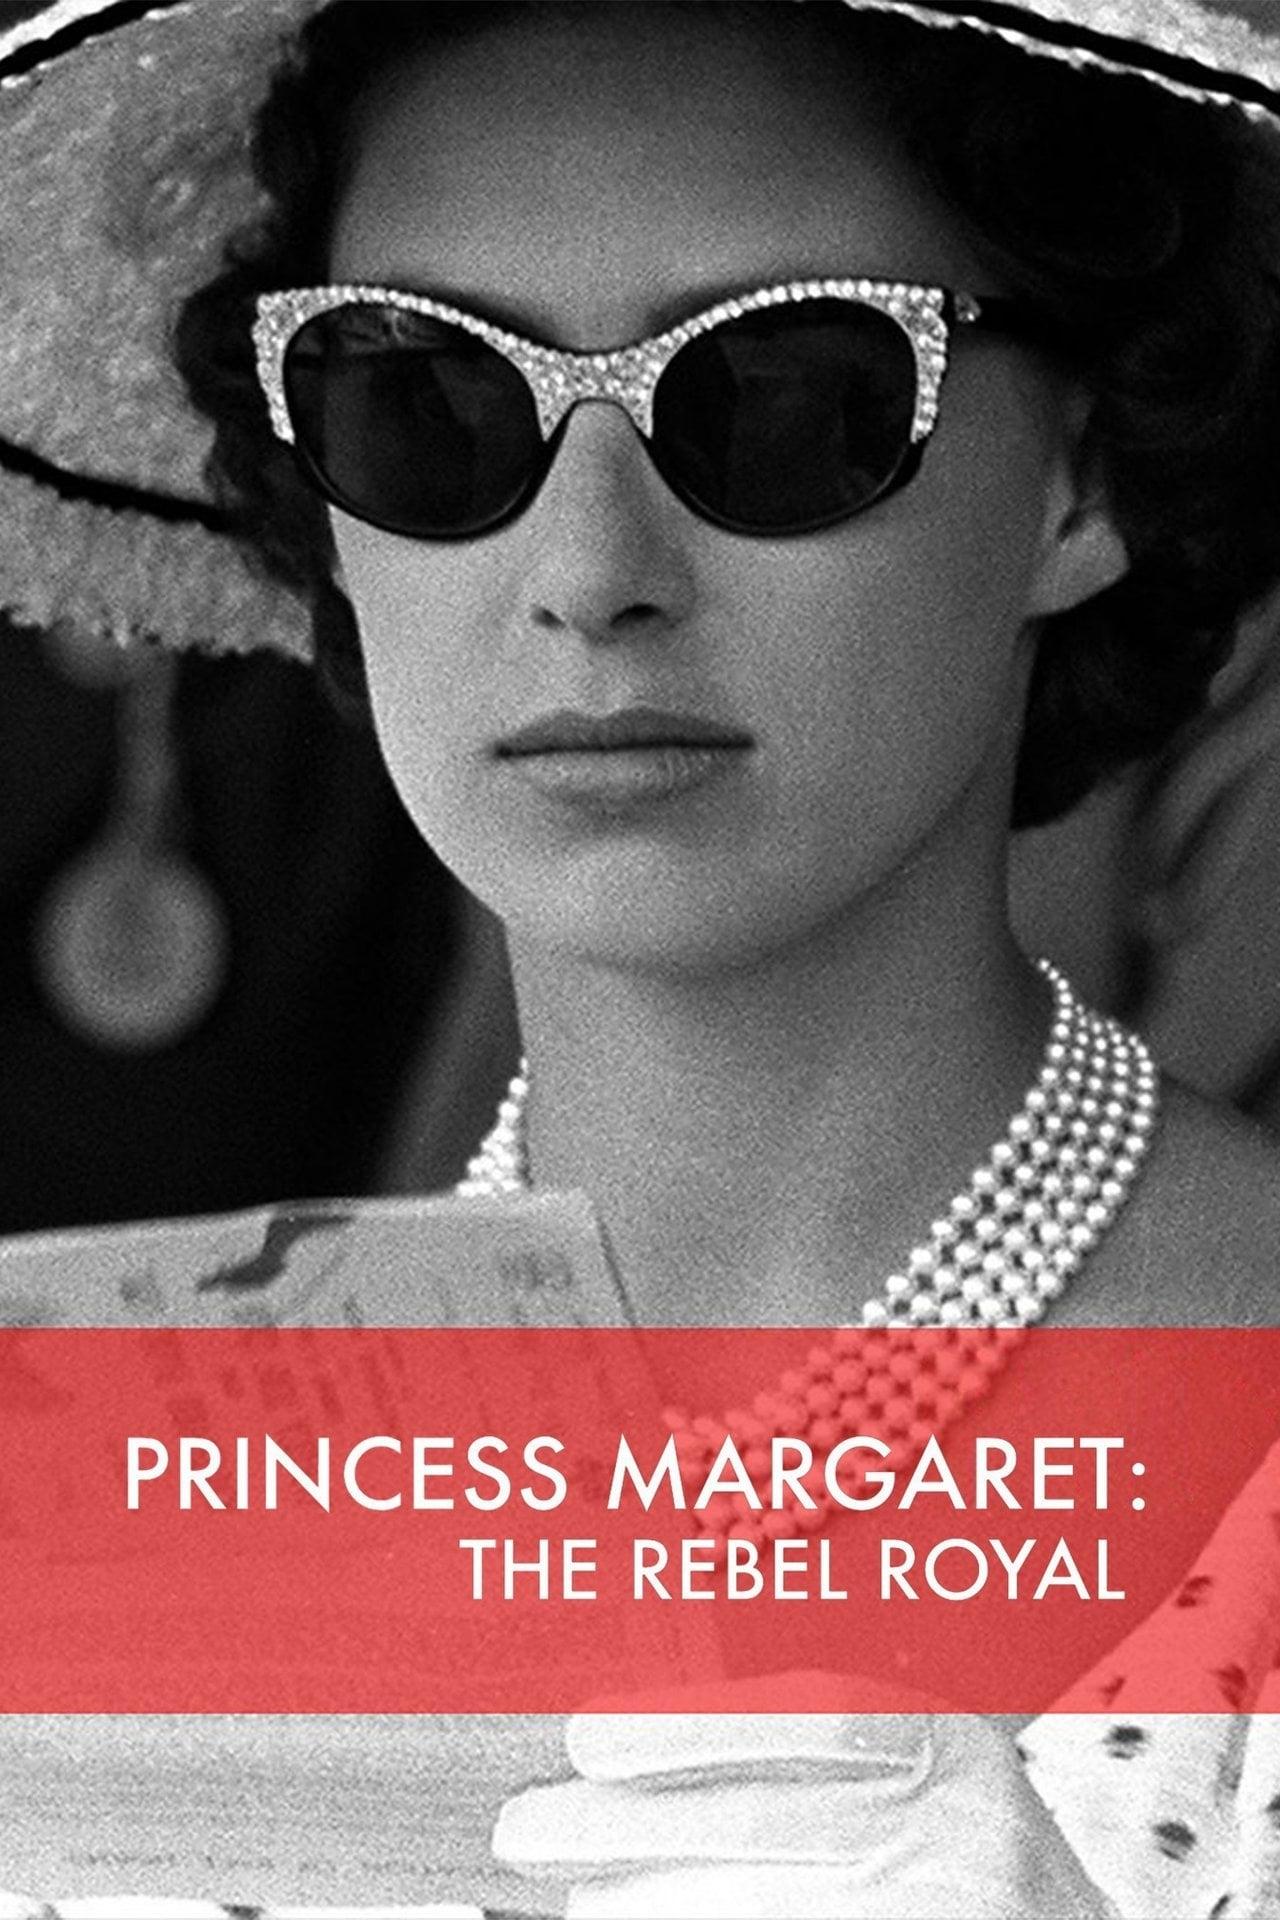 Princess Margaret: The Rebel Royal streaming sur zone telechargement